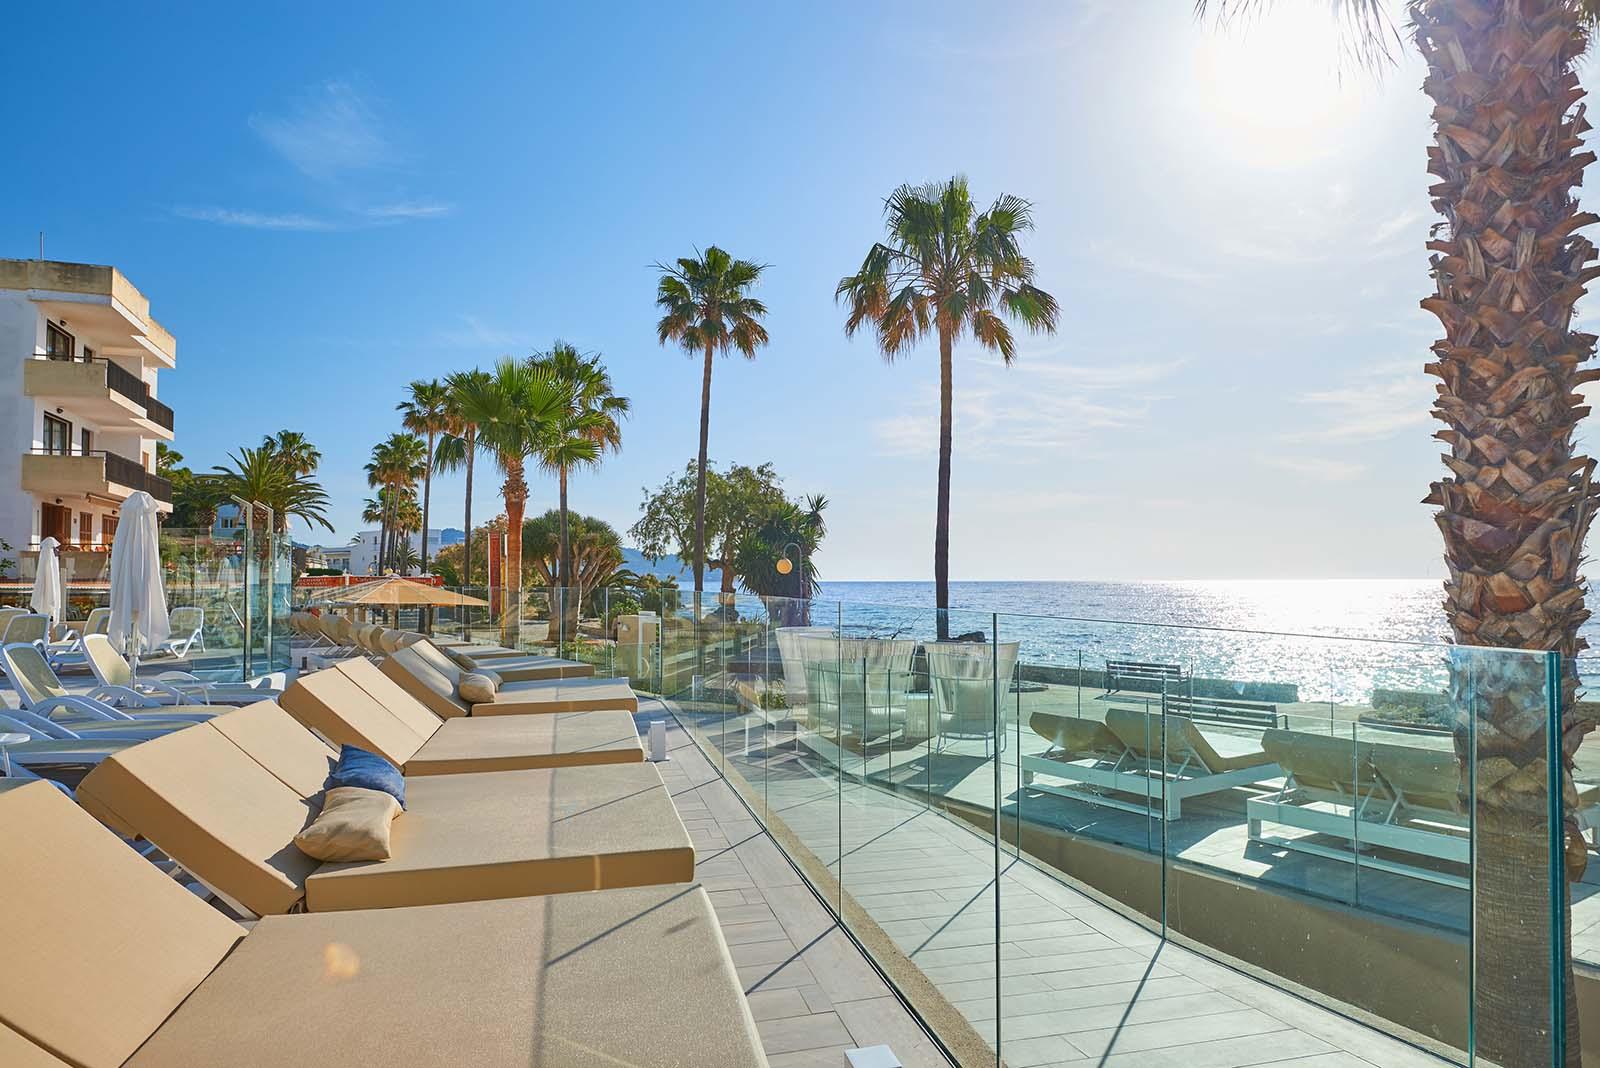 Protur Bonamar Hotel 4 In Cala Millor Mallorca Protur Hotels